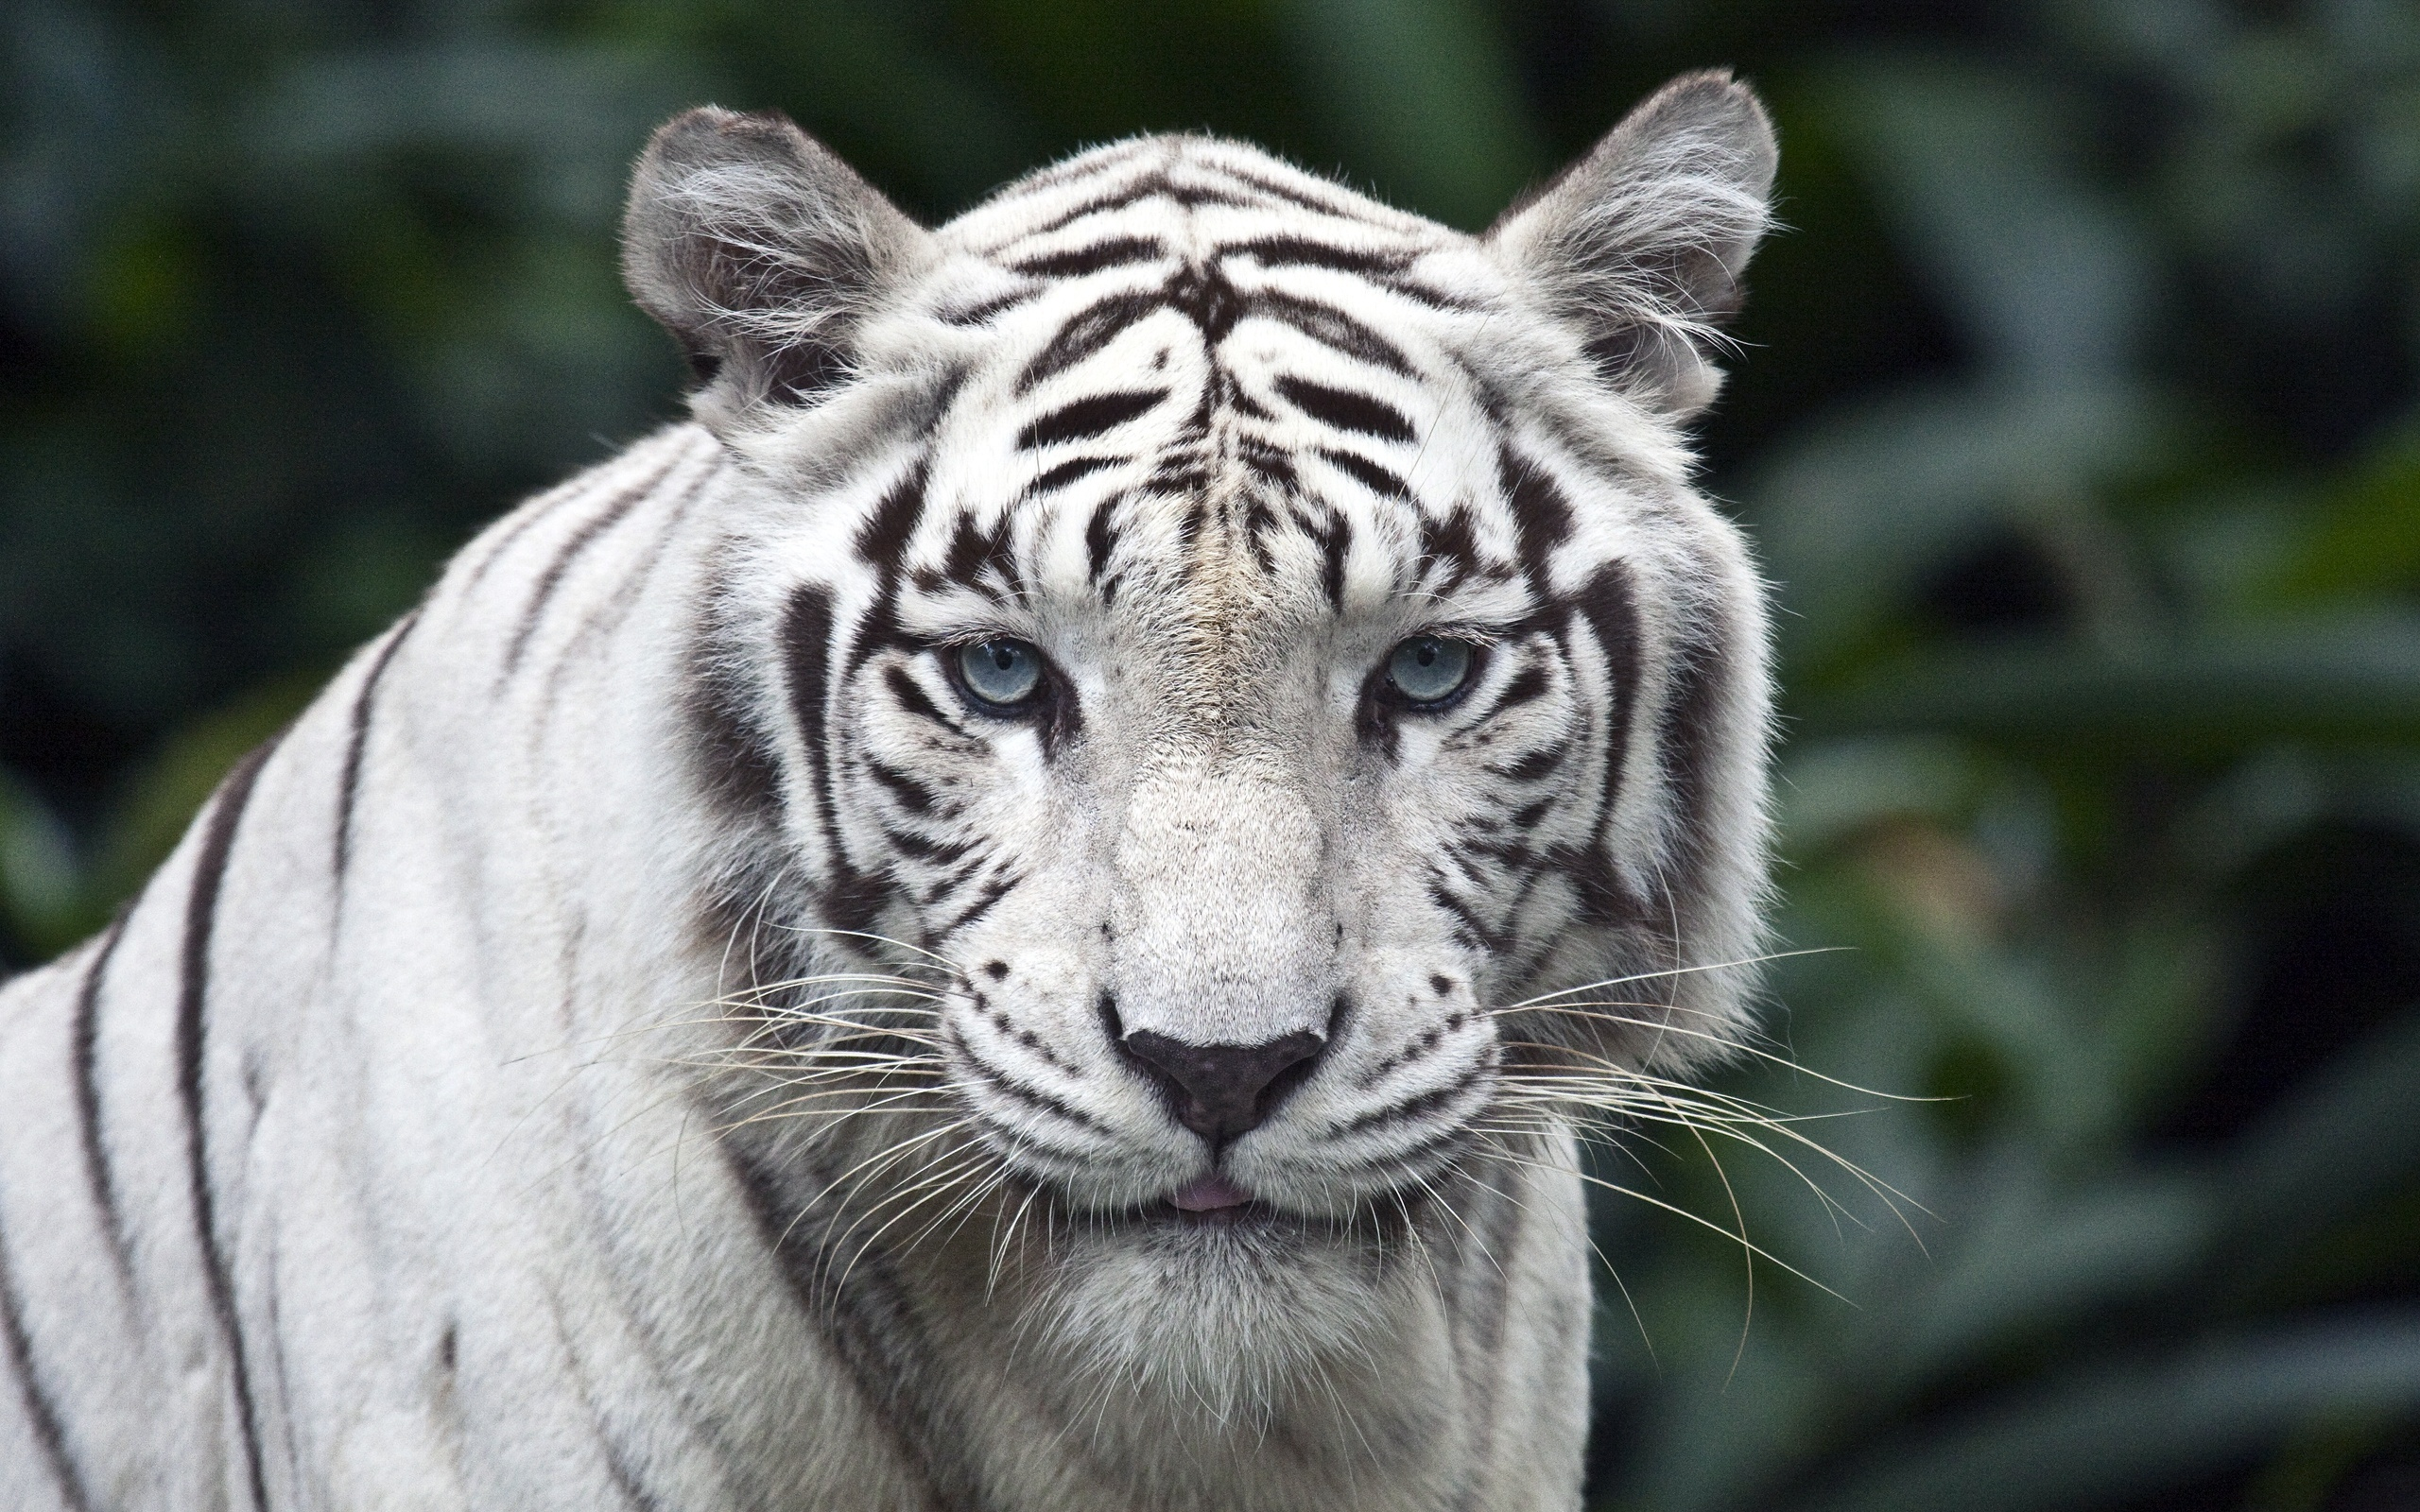 white_tiger_close_up-wide.jpg